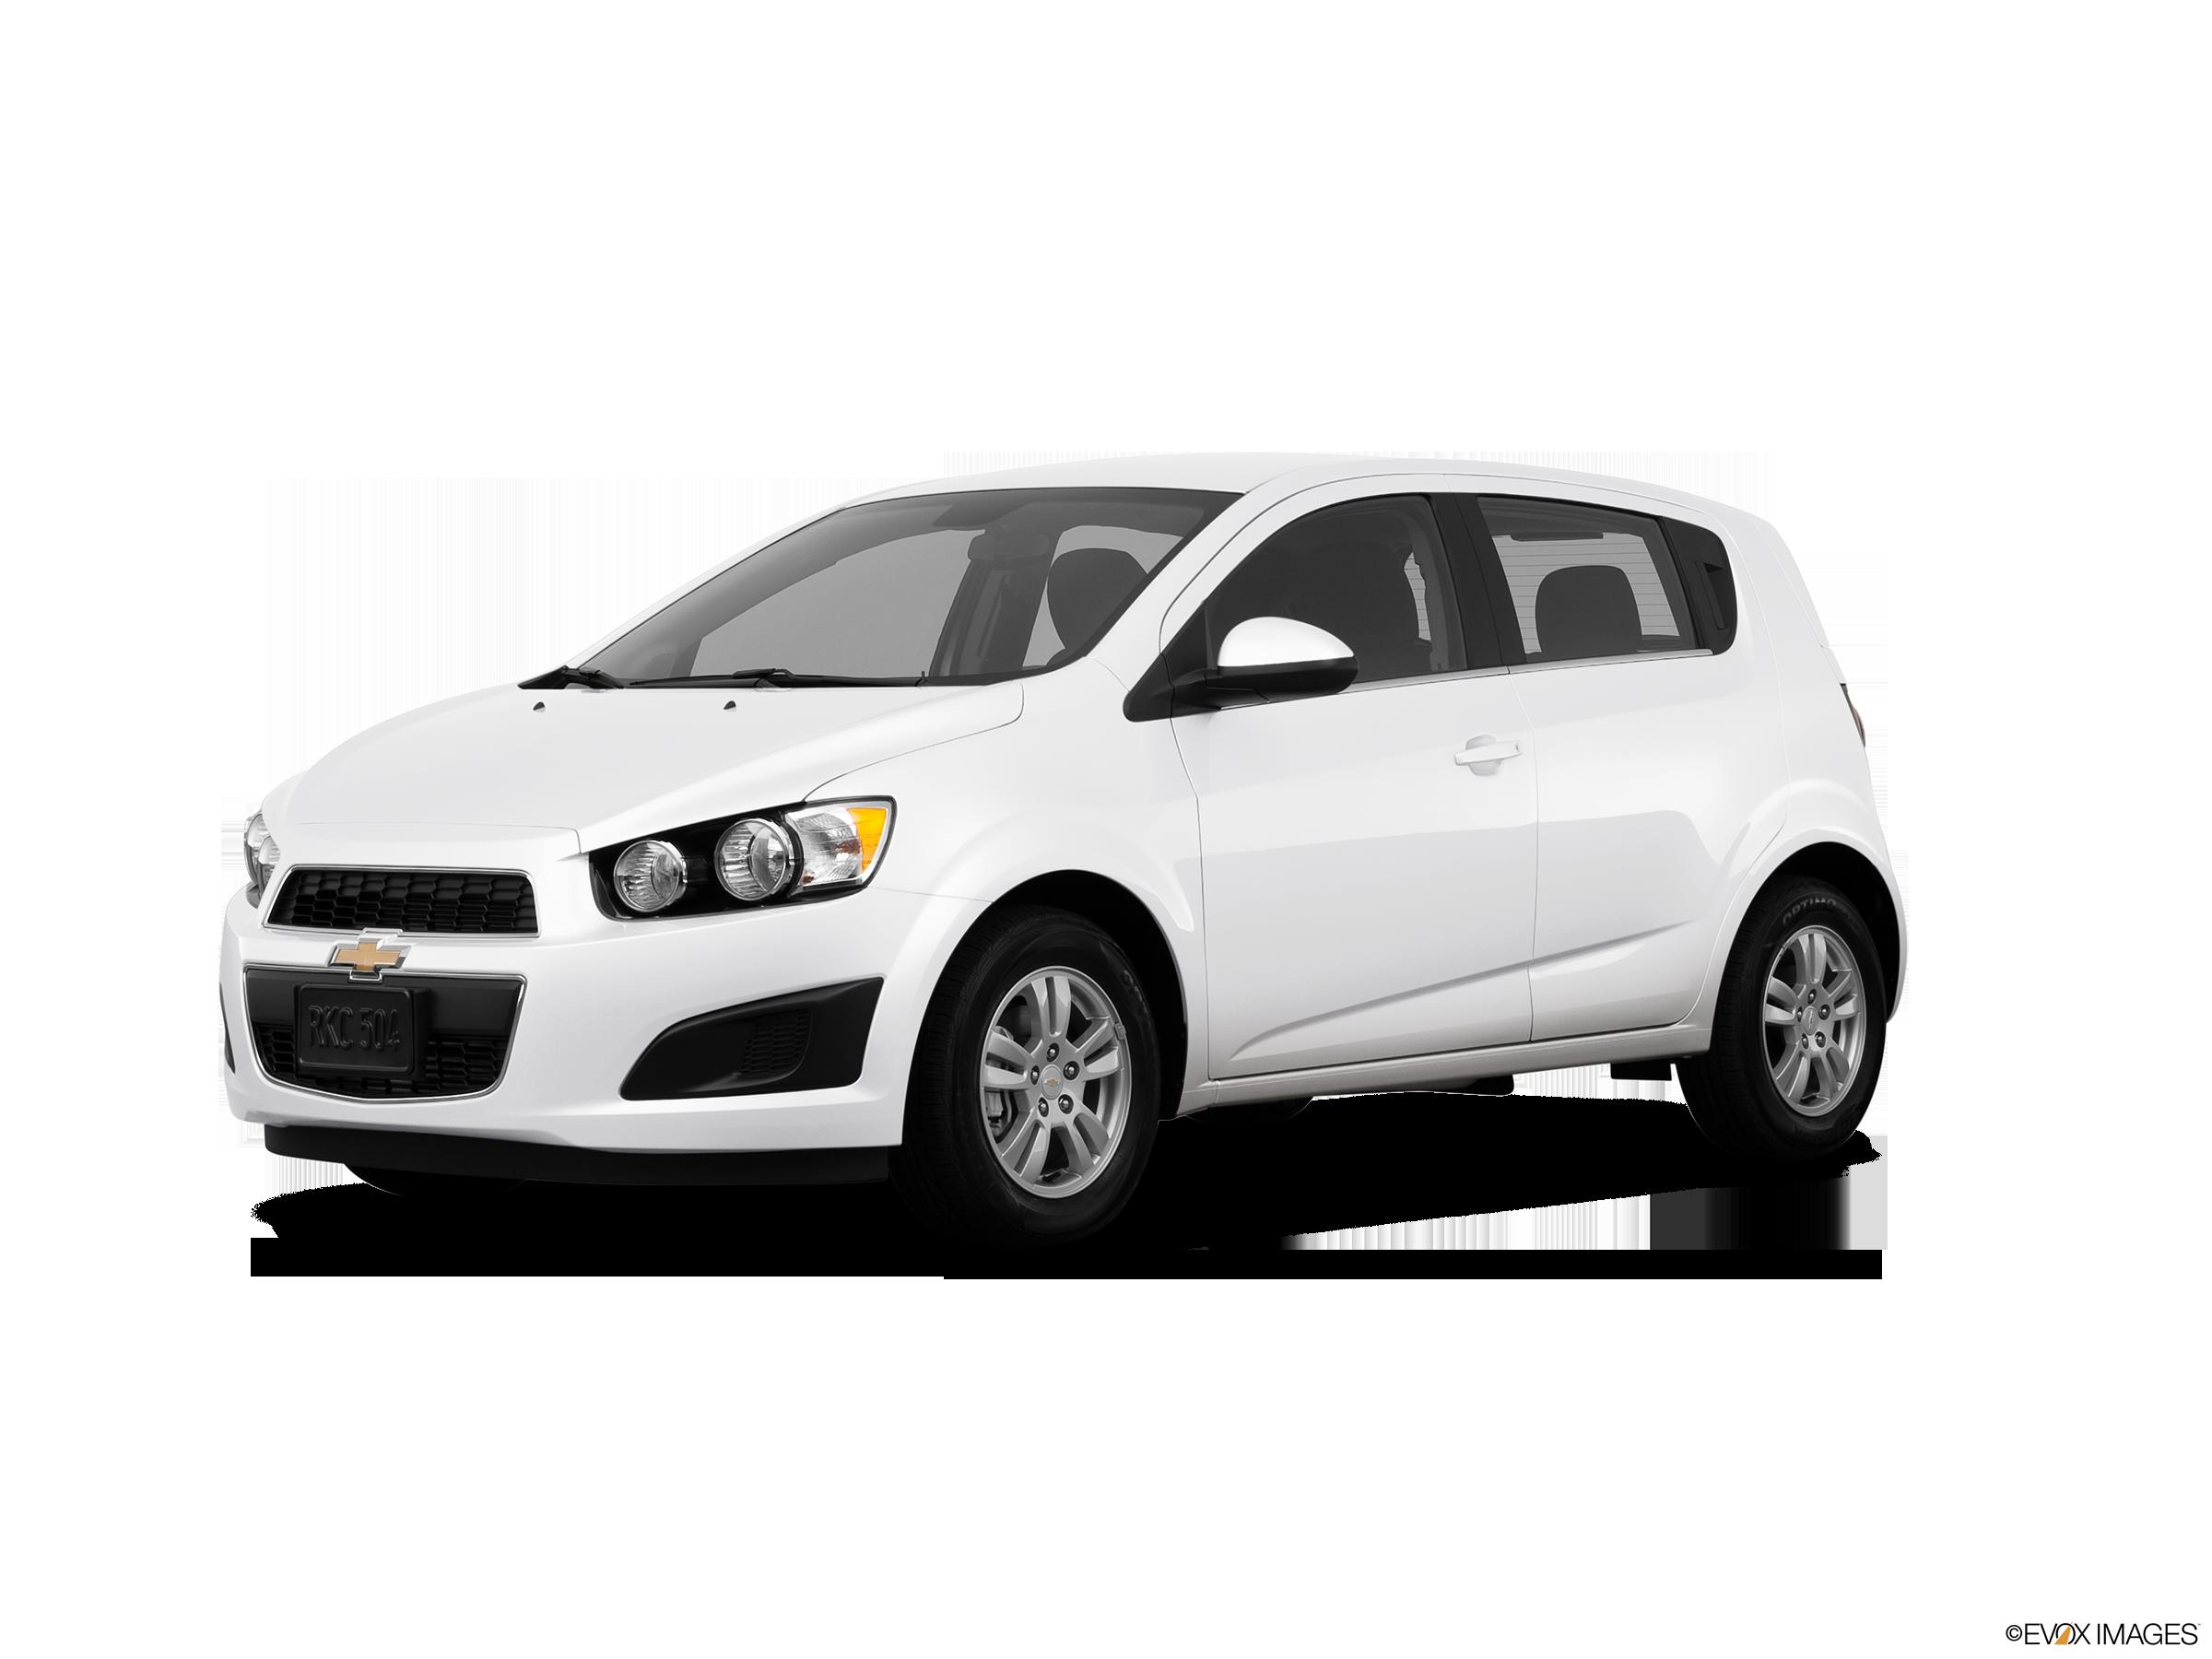 Kekurangan Sonic Chevrolet 2013 Perbandingan Harga